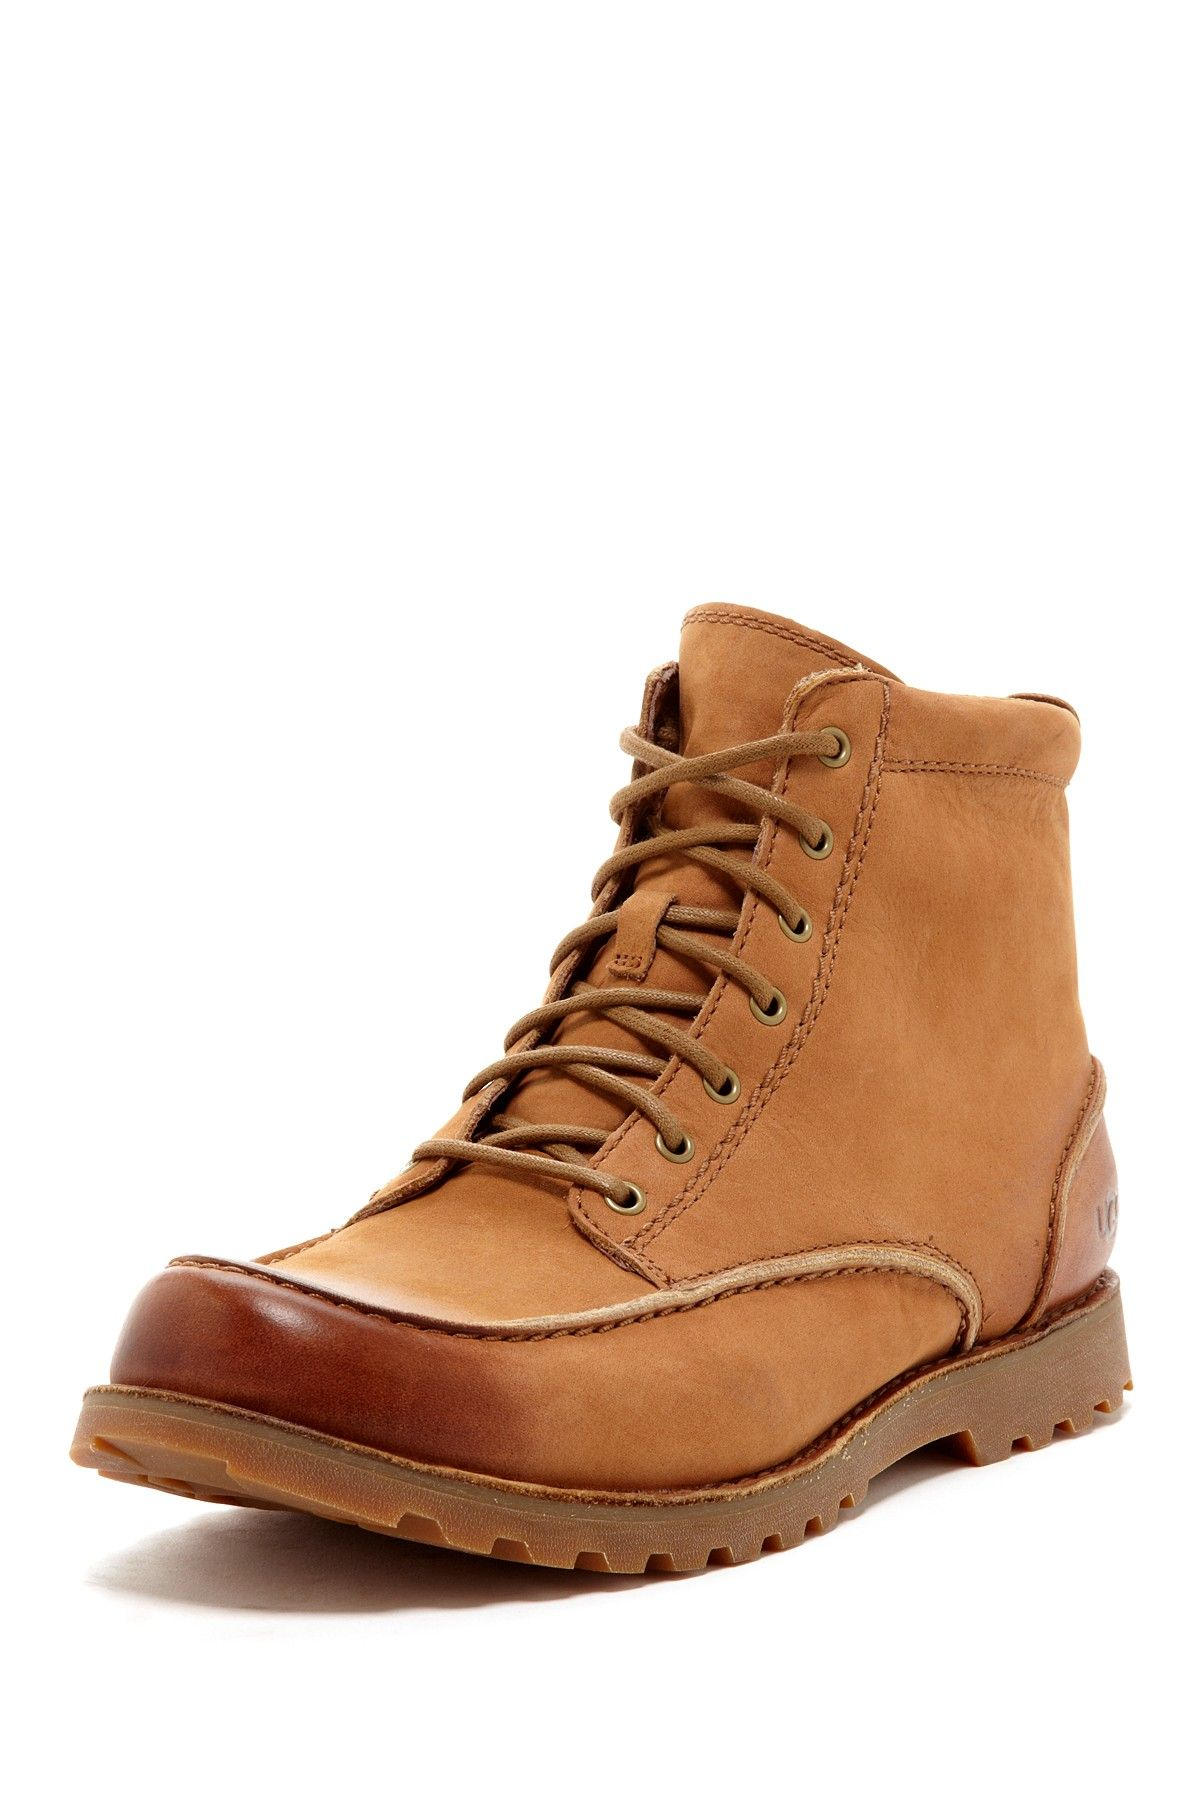 UGG Australia Fallbrook Boot Boot #Lace-upMen #Shoes   MyStyle ...